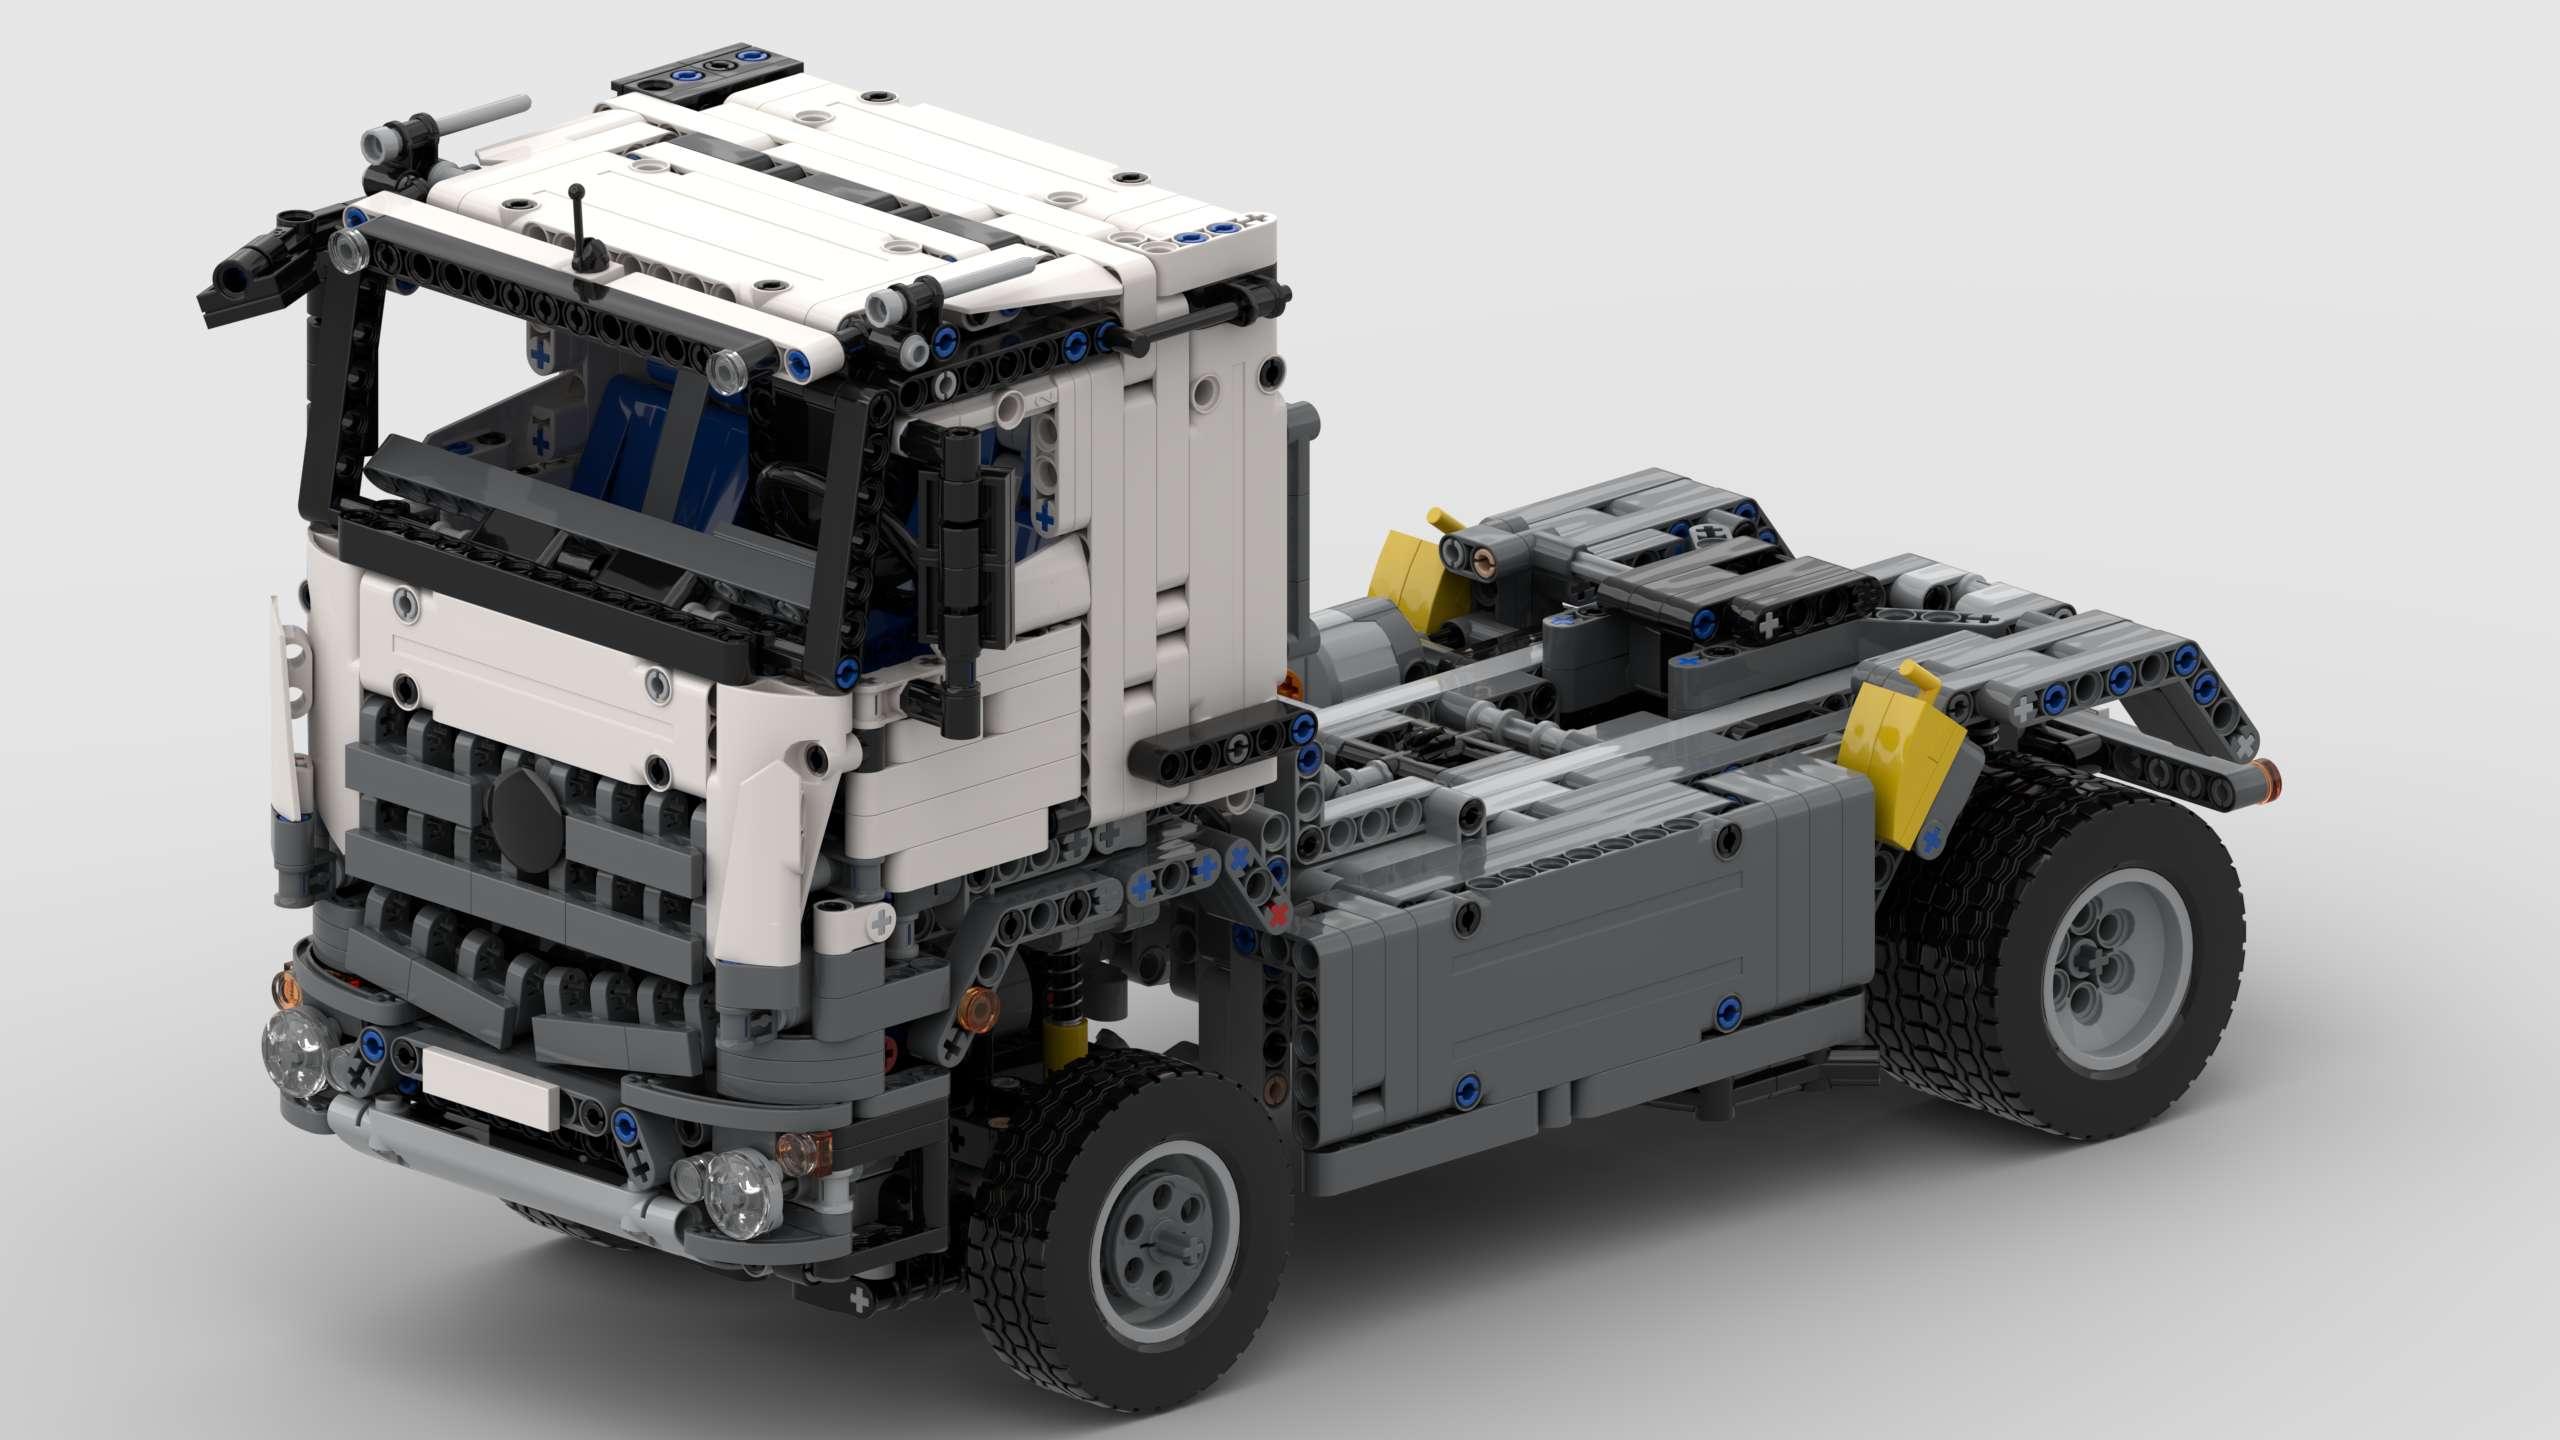 http://mistercreator.de/produkt/lego-42043-mercedes-arocs-rc-umbau/